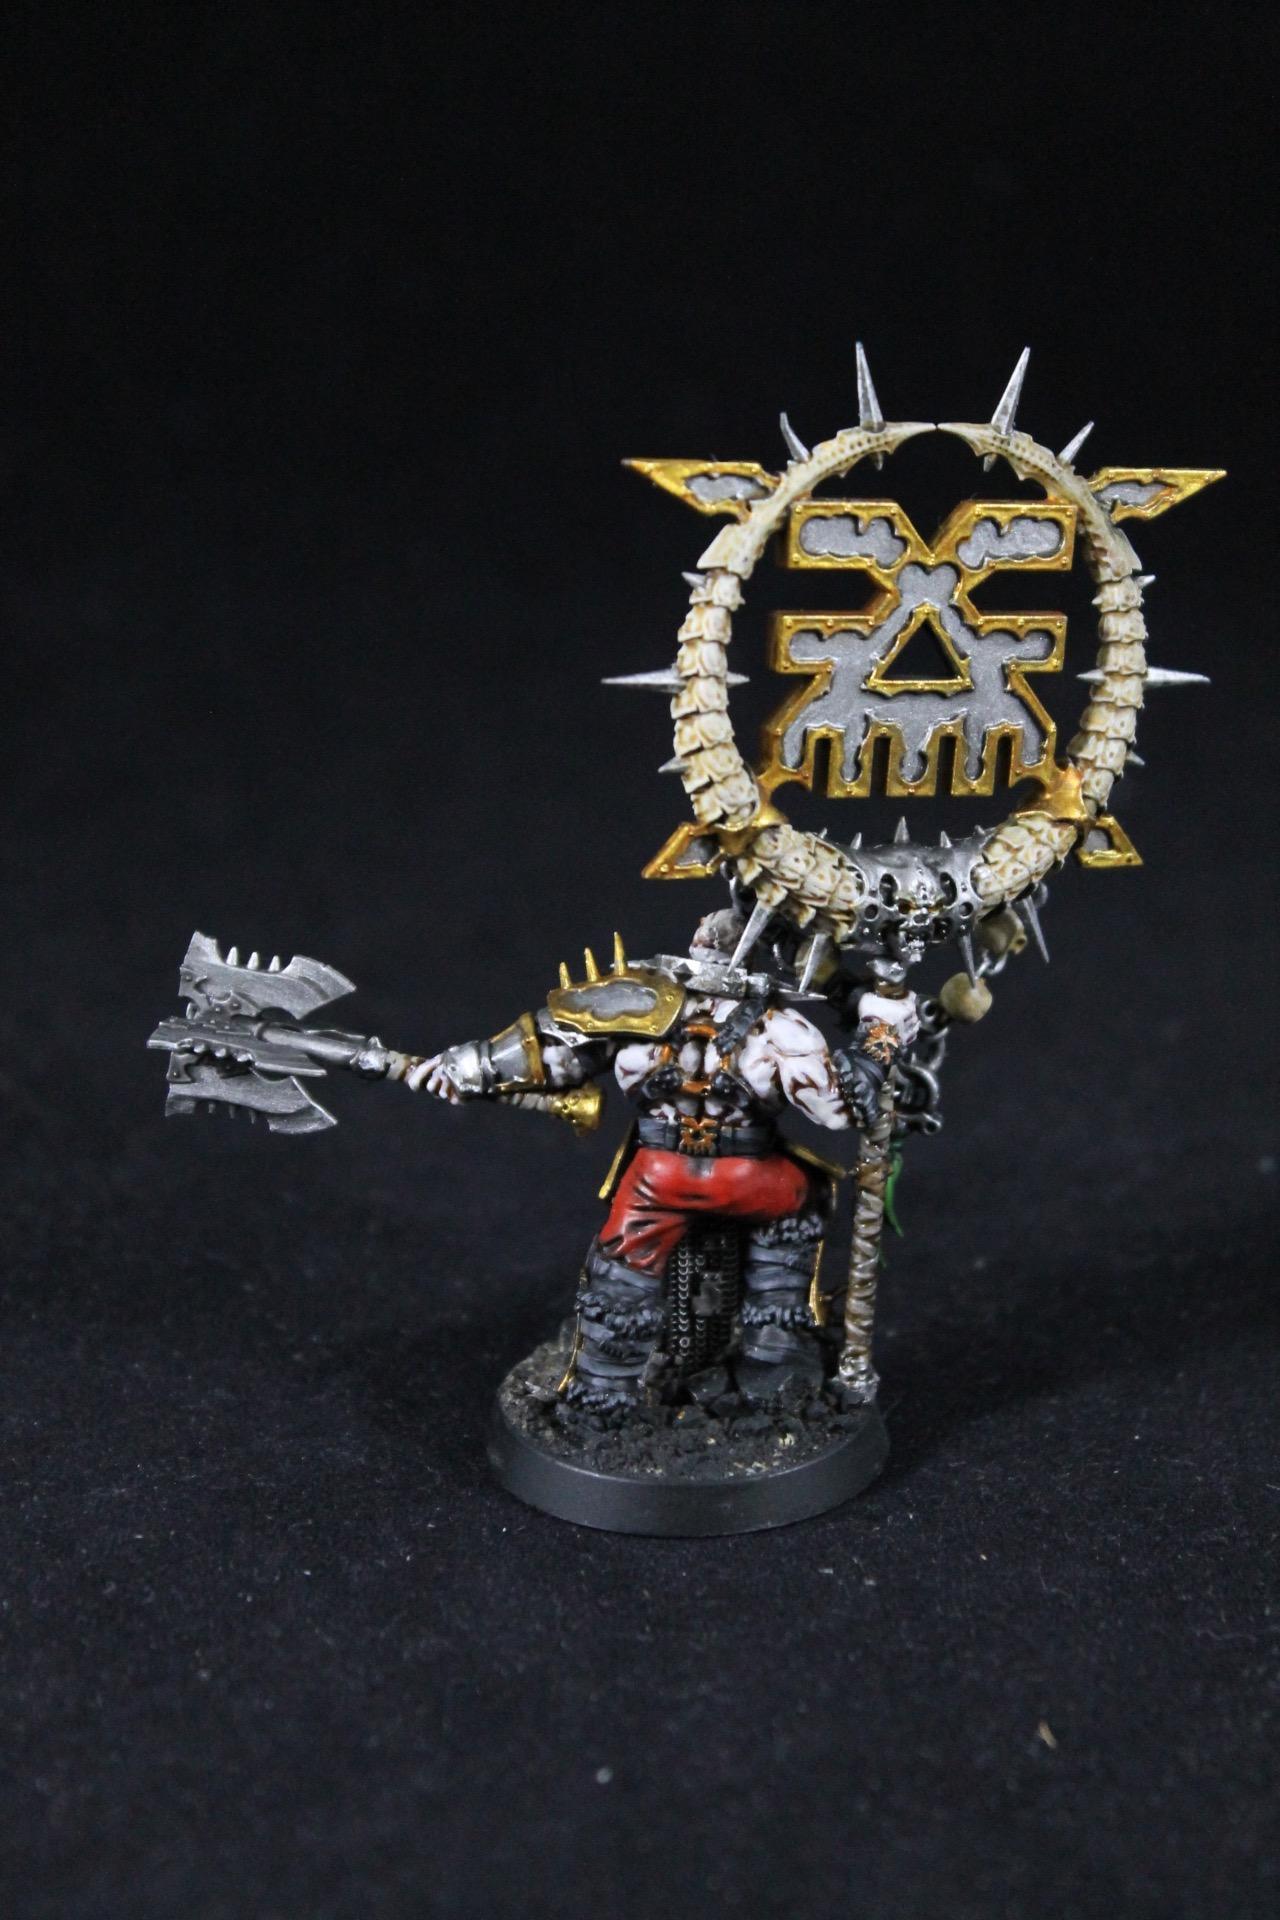 Age Of Sigmar, Blood, Blood God, Chaos, Khorne, Khorne Bloodbound, Warhammer Fantasy